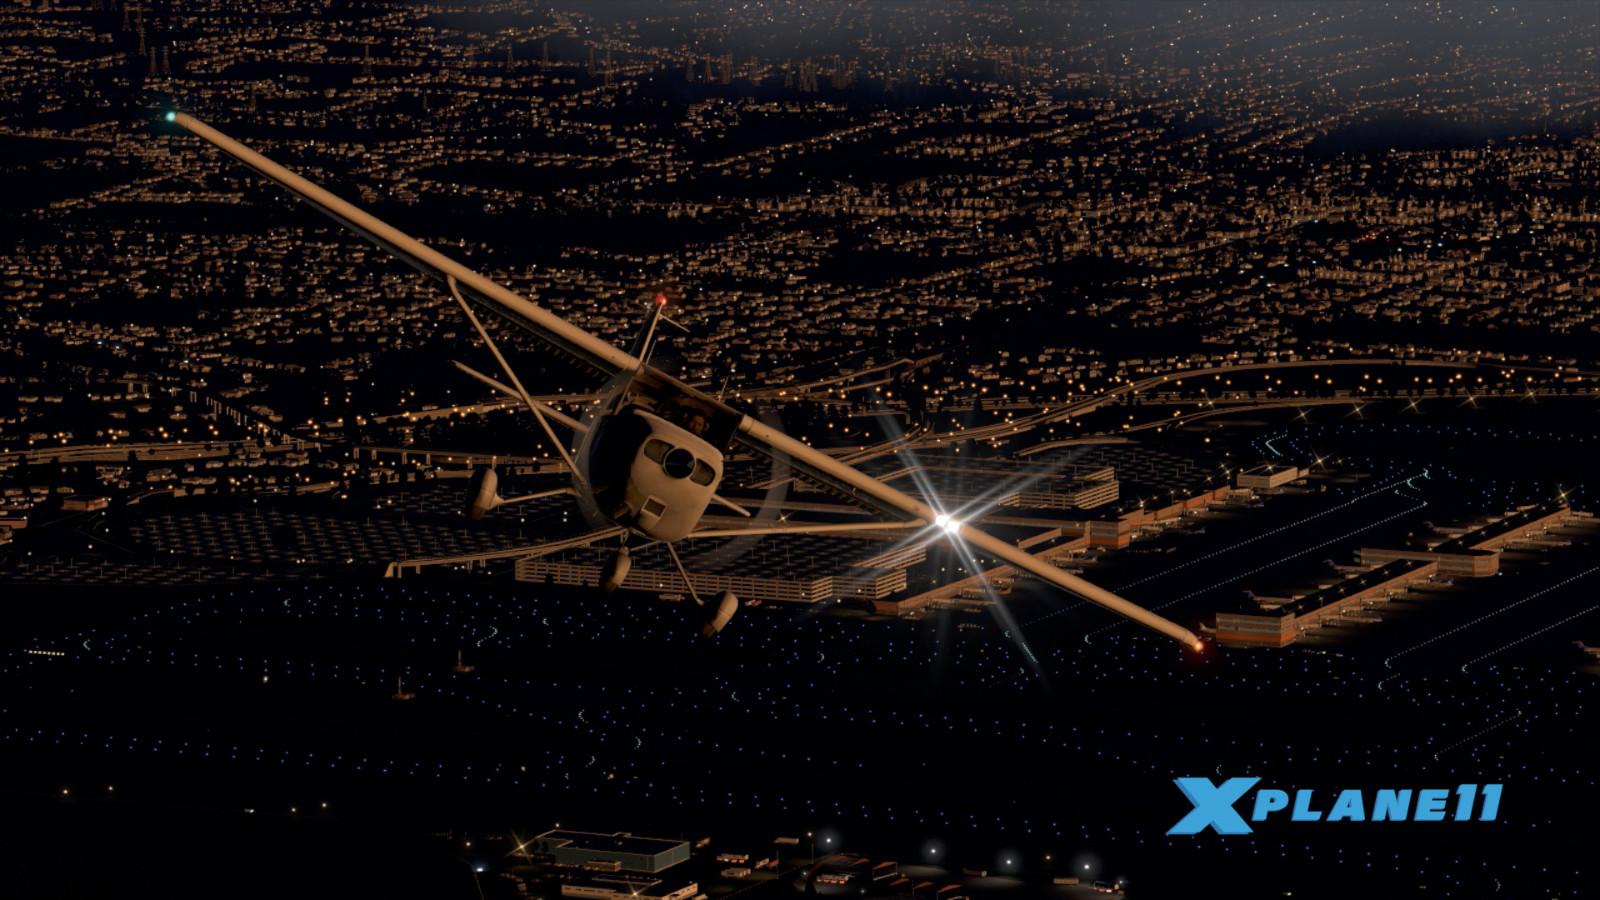 X-Plane 11 ESPAÑOL PC Full + Global Scenery DLC (CODEX) + REPACK 13 DVD5 (JPW) 2